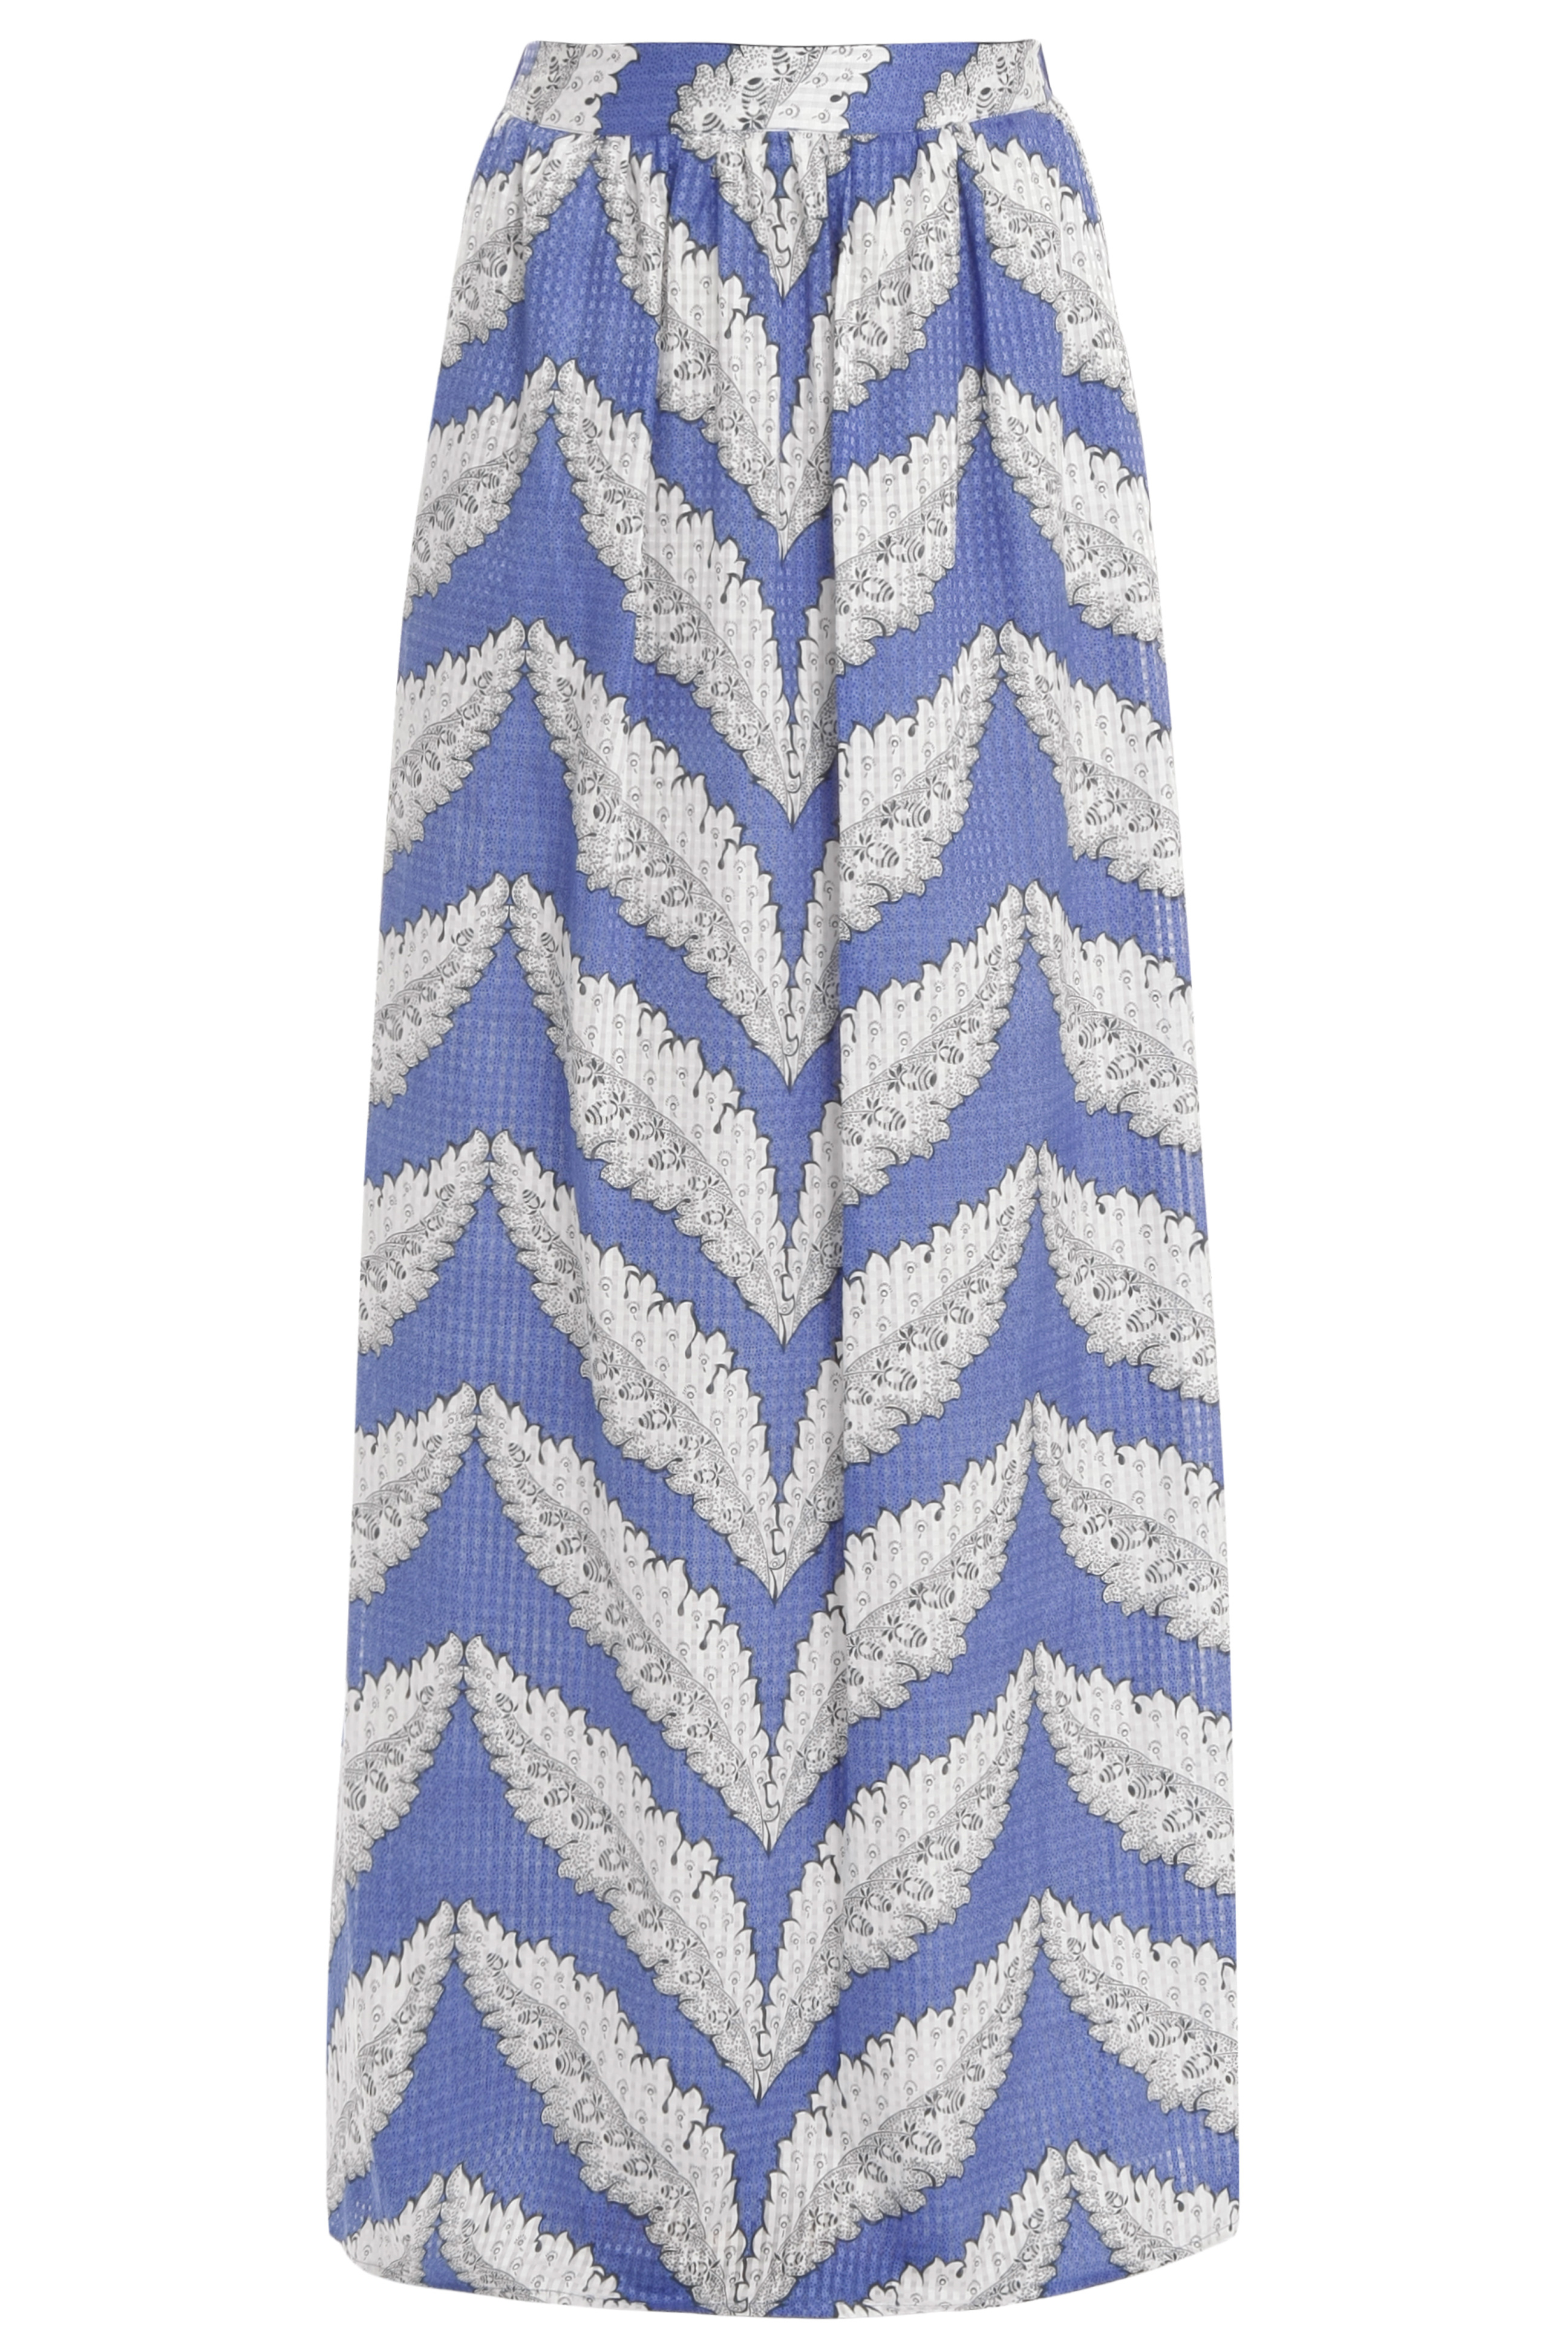 paul joe maxi skirt feather print in blue lyst